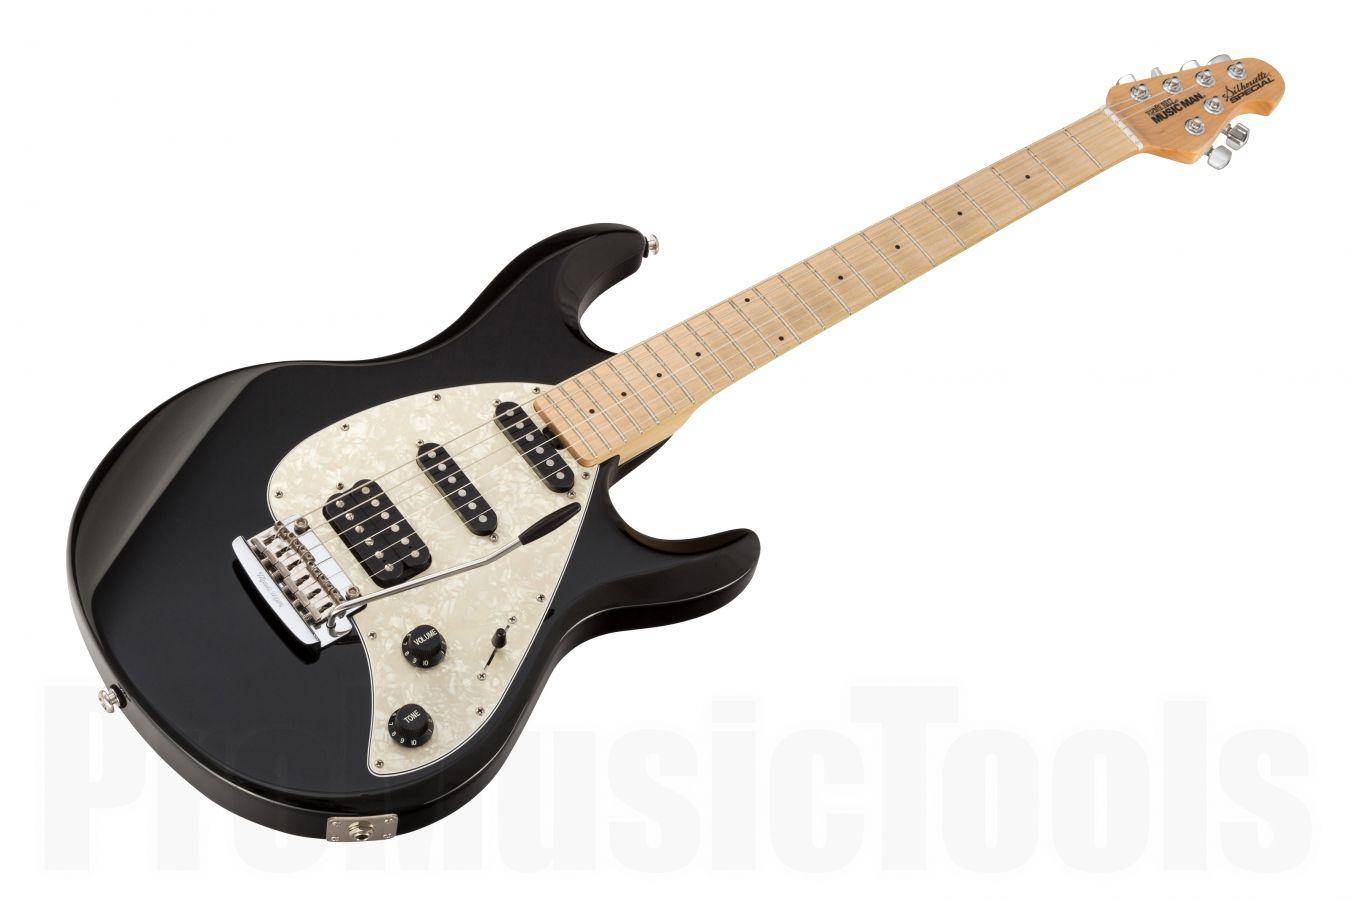 Music Man USA Silhouette Special HSS Trem BK - Black MN